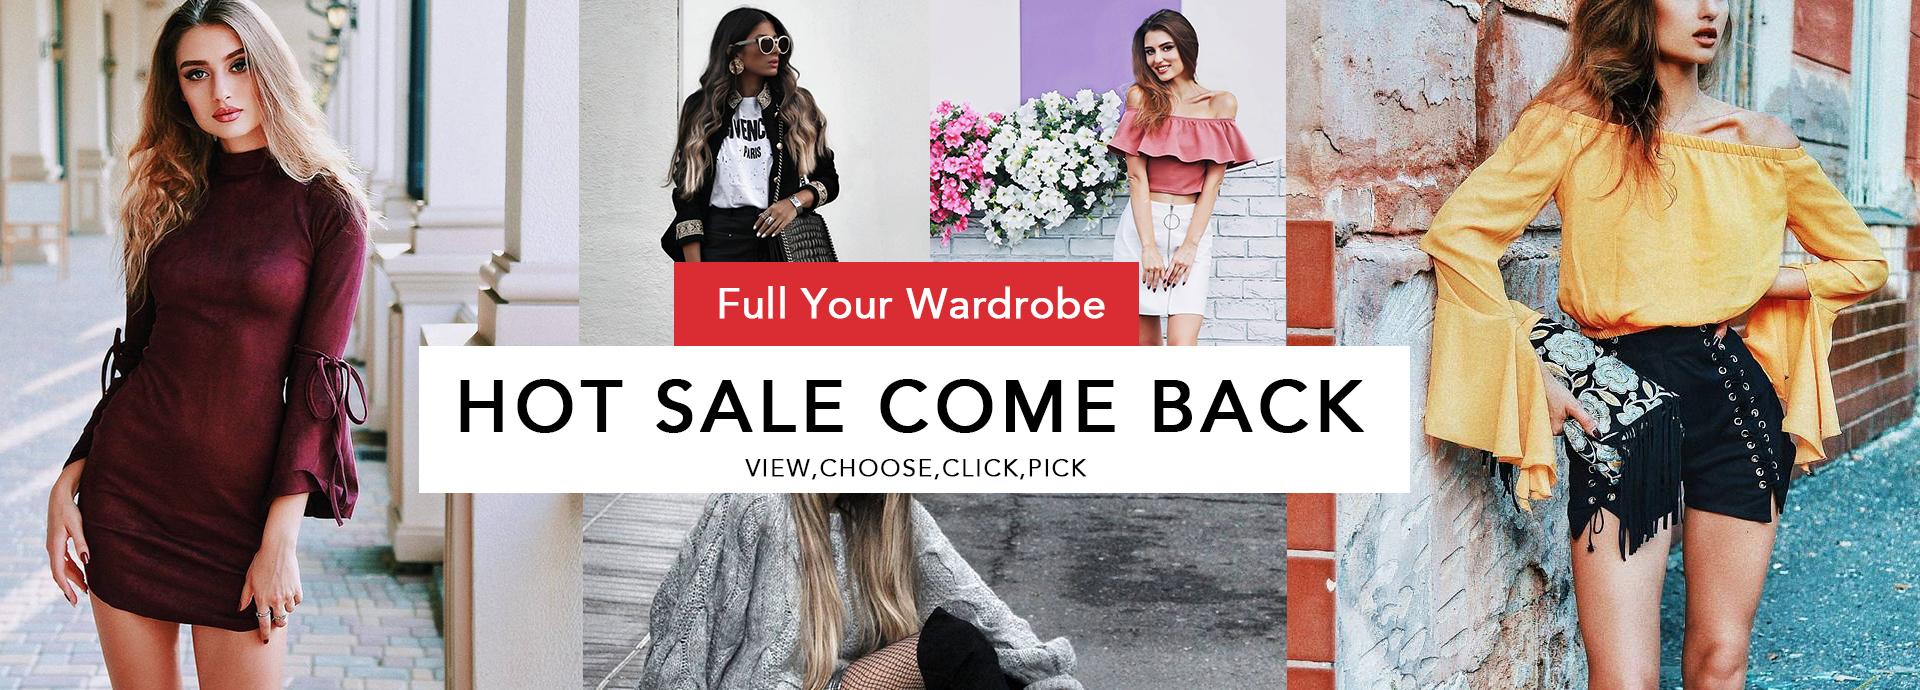 Hot Sale Come Back